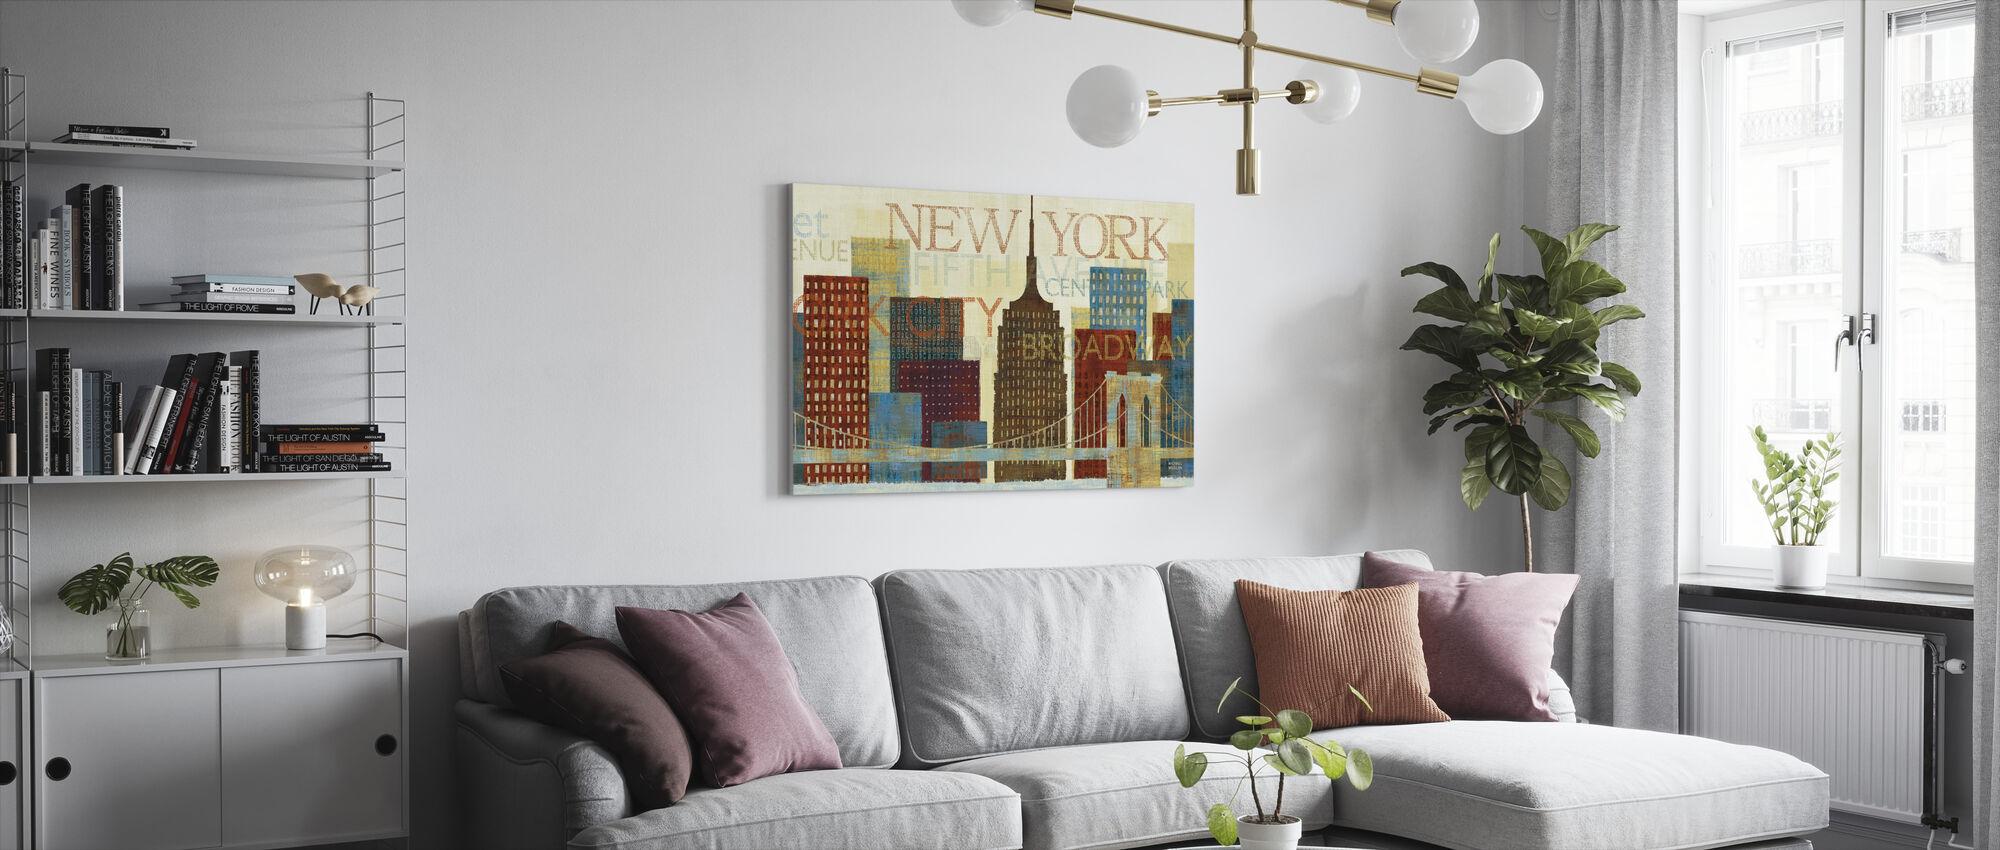 Hey New York - Canvas print - Living Room